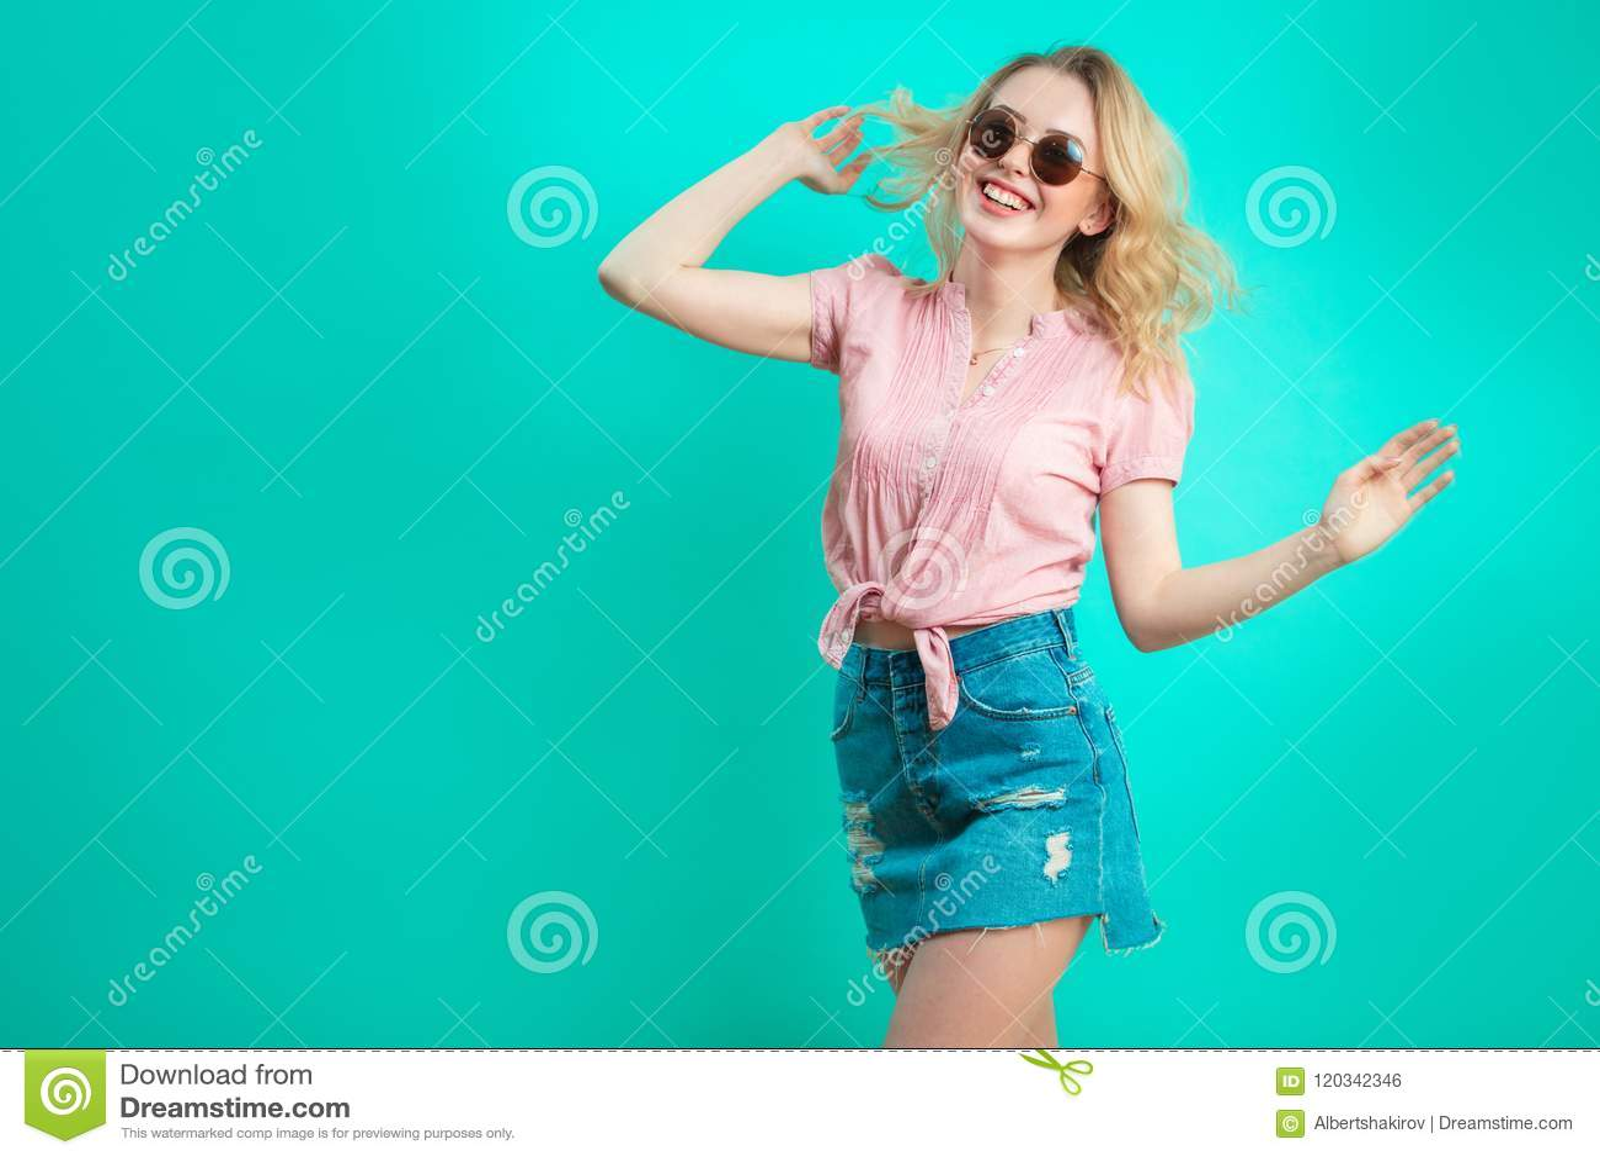 Menina caucasiano alegre com o cabelo encaracolado longo isolado no fundo azul